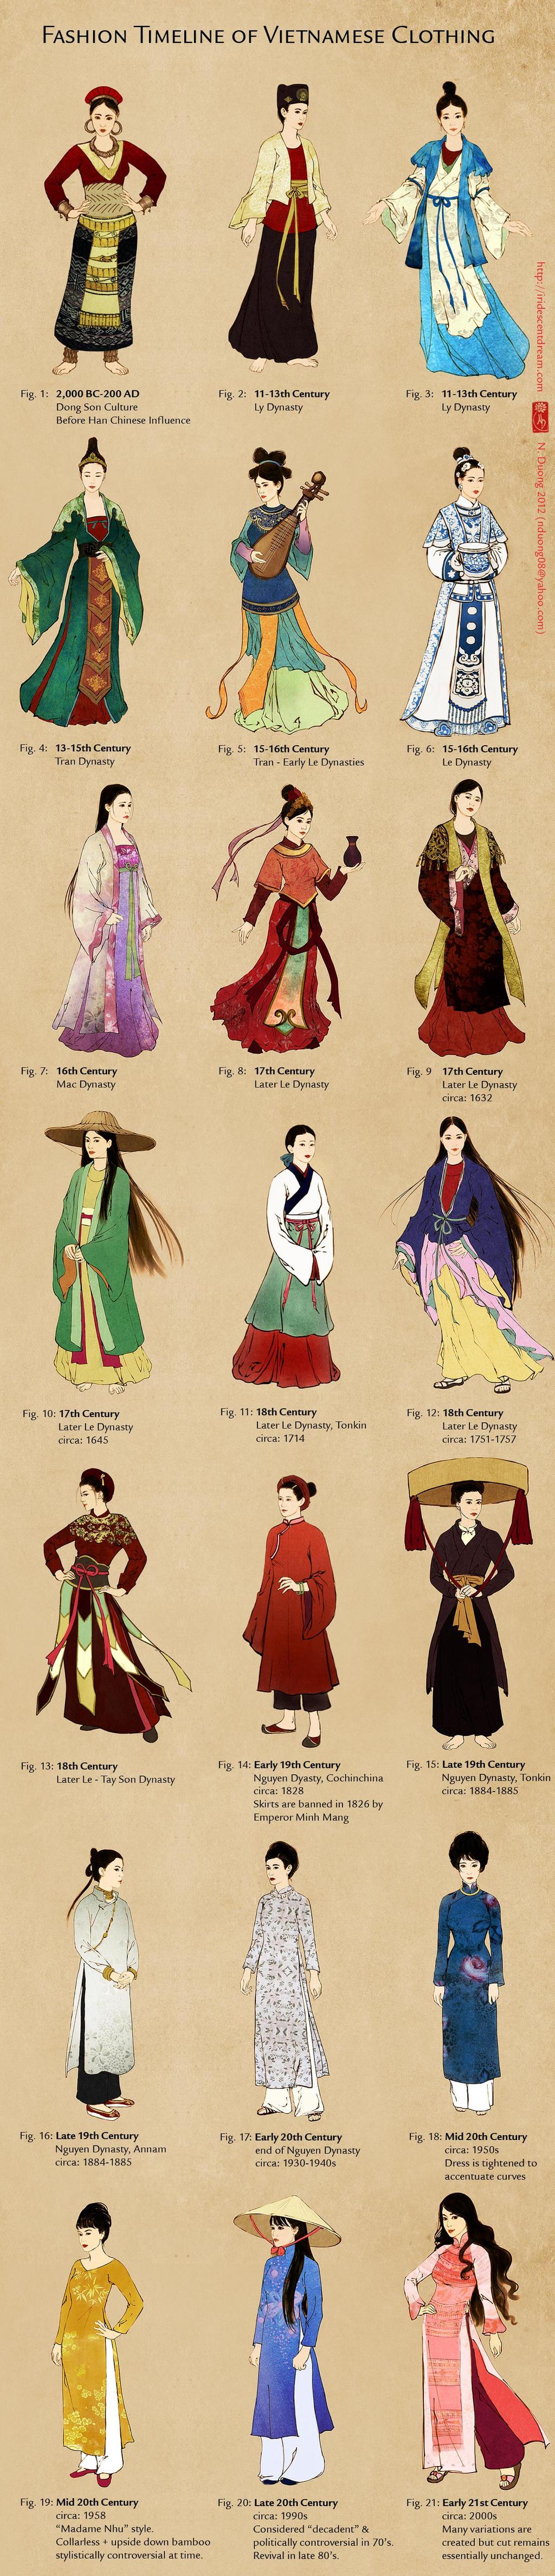 Fashion history timeline 1800s dress